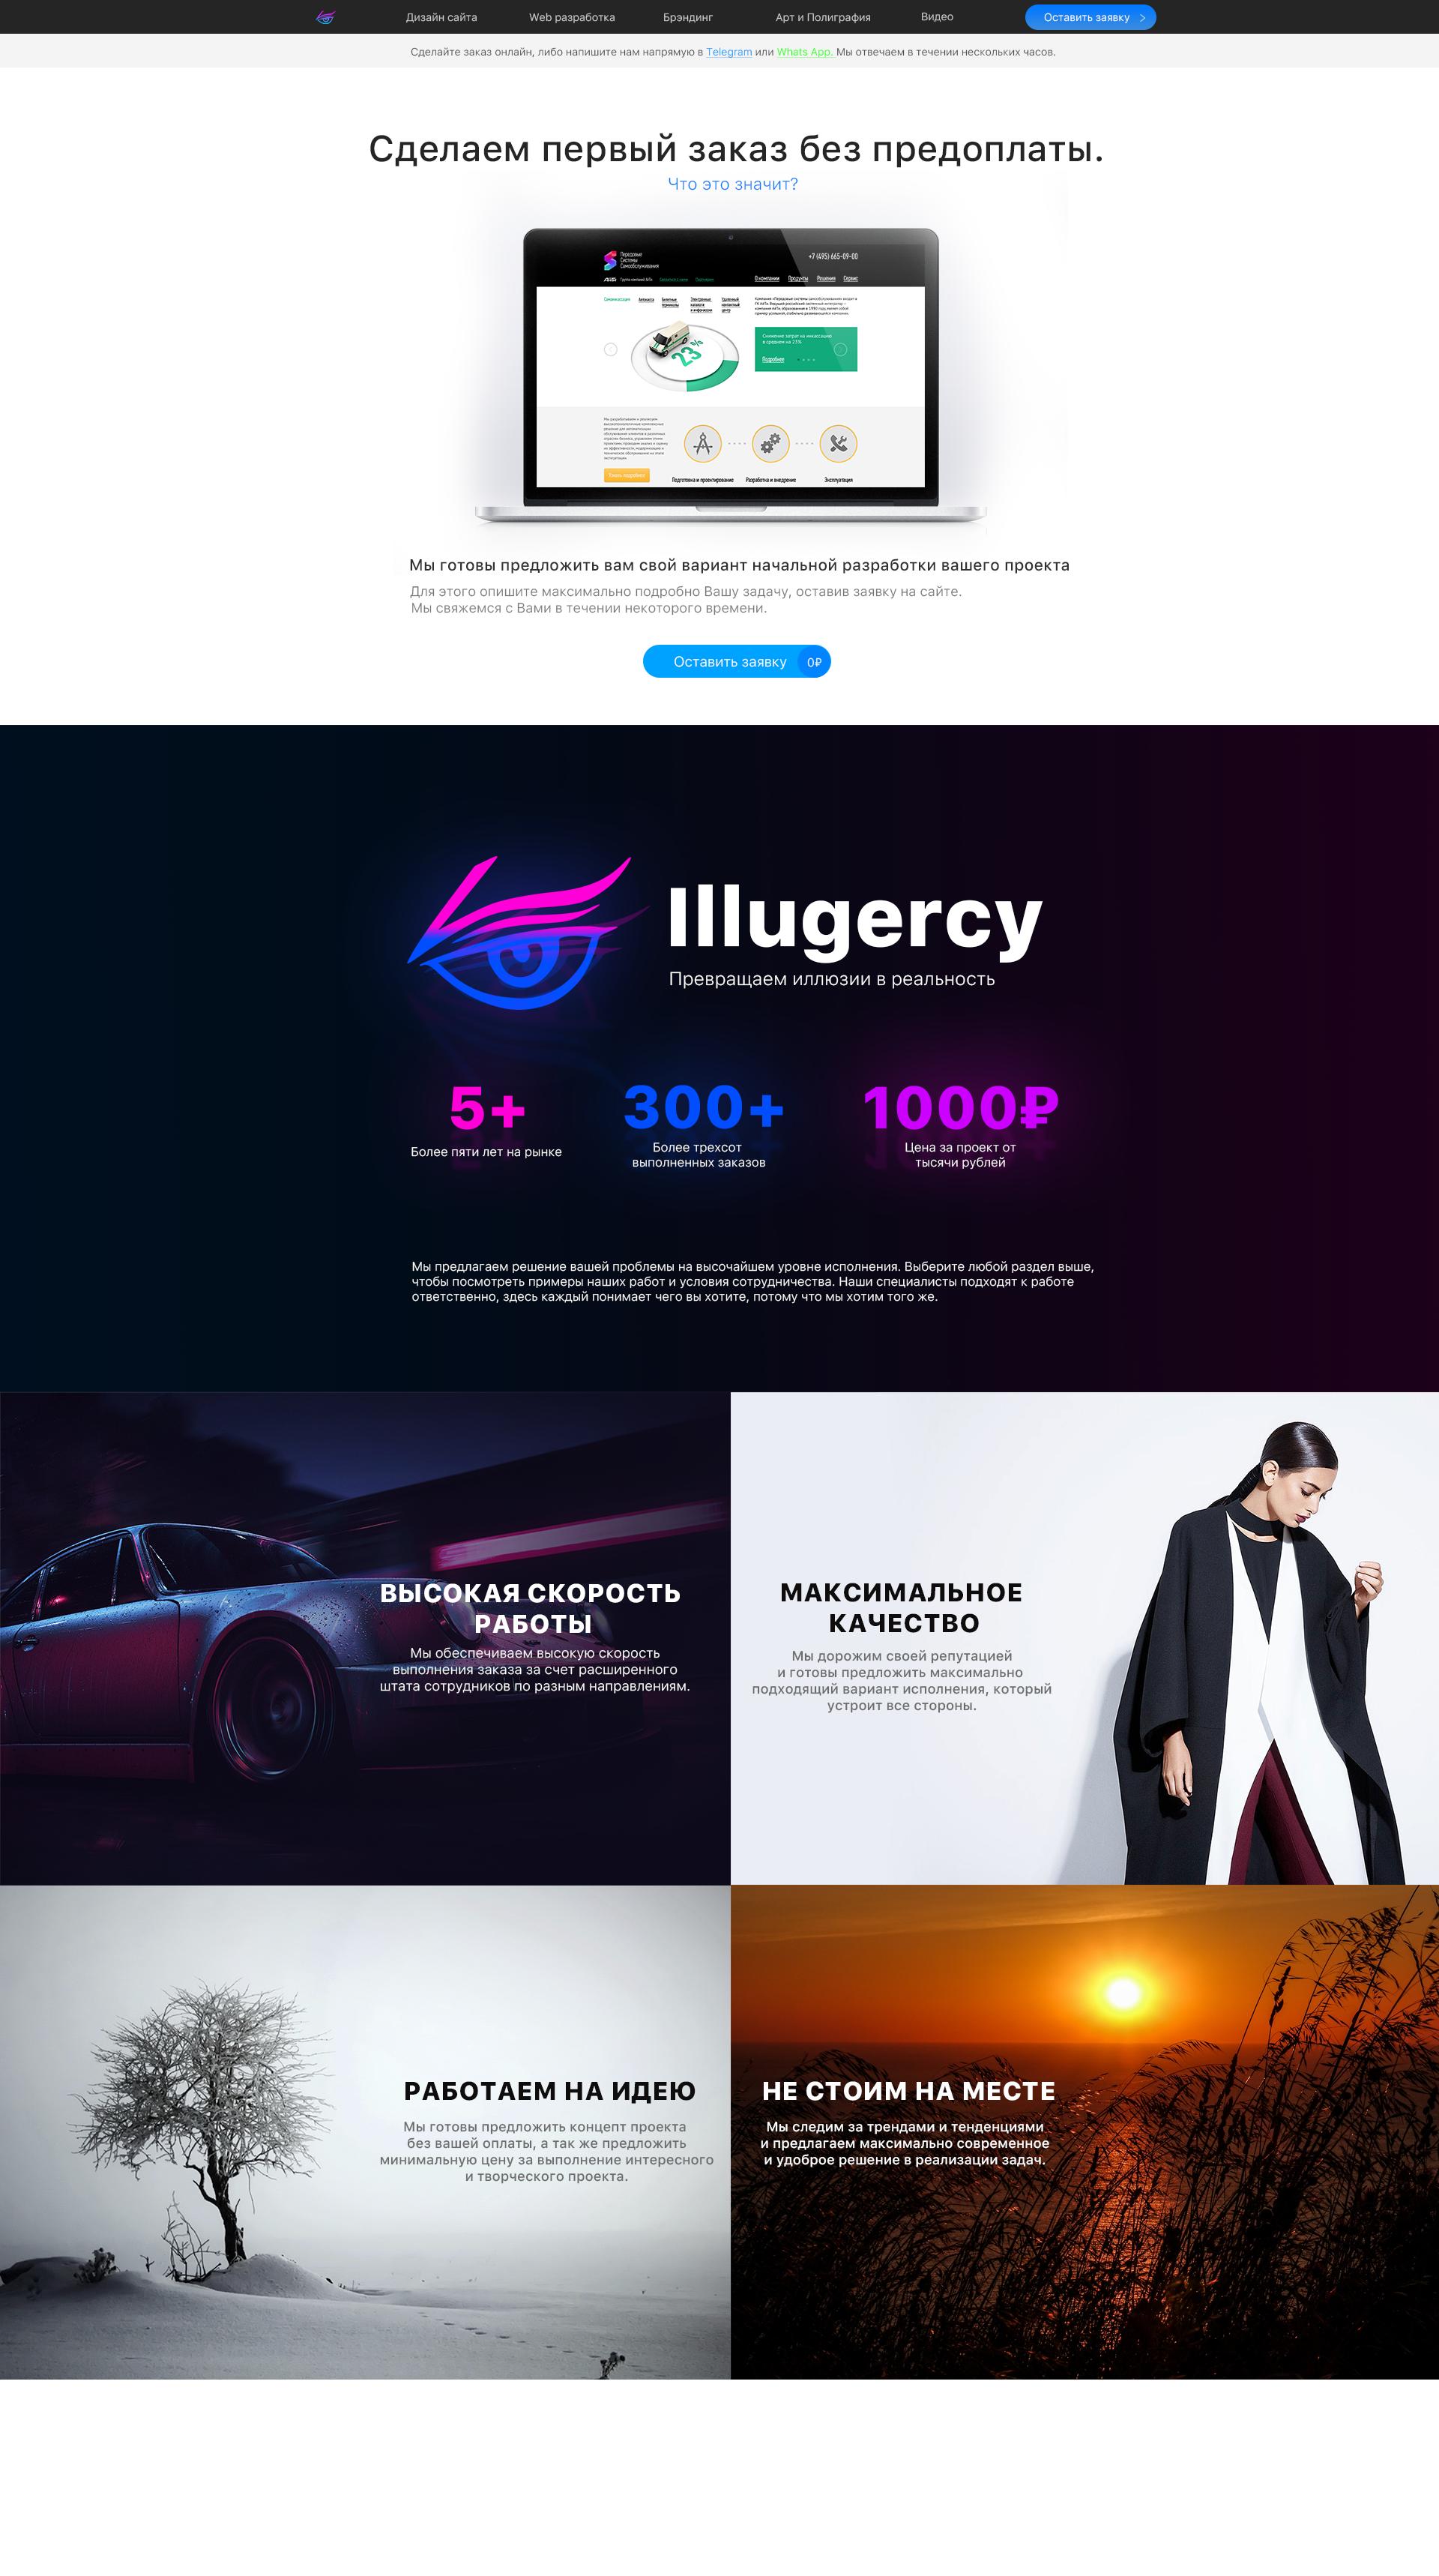 illugercy design